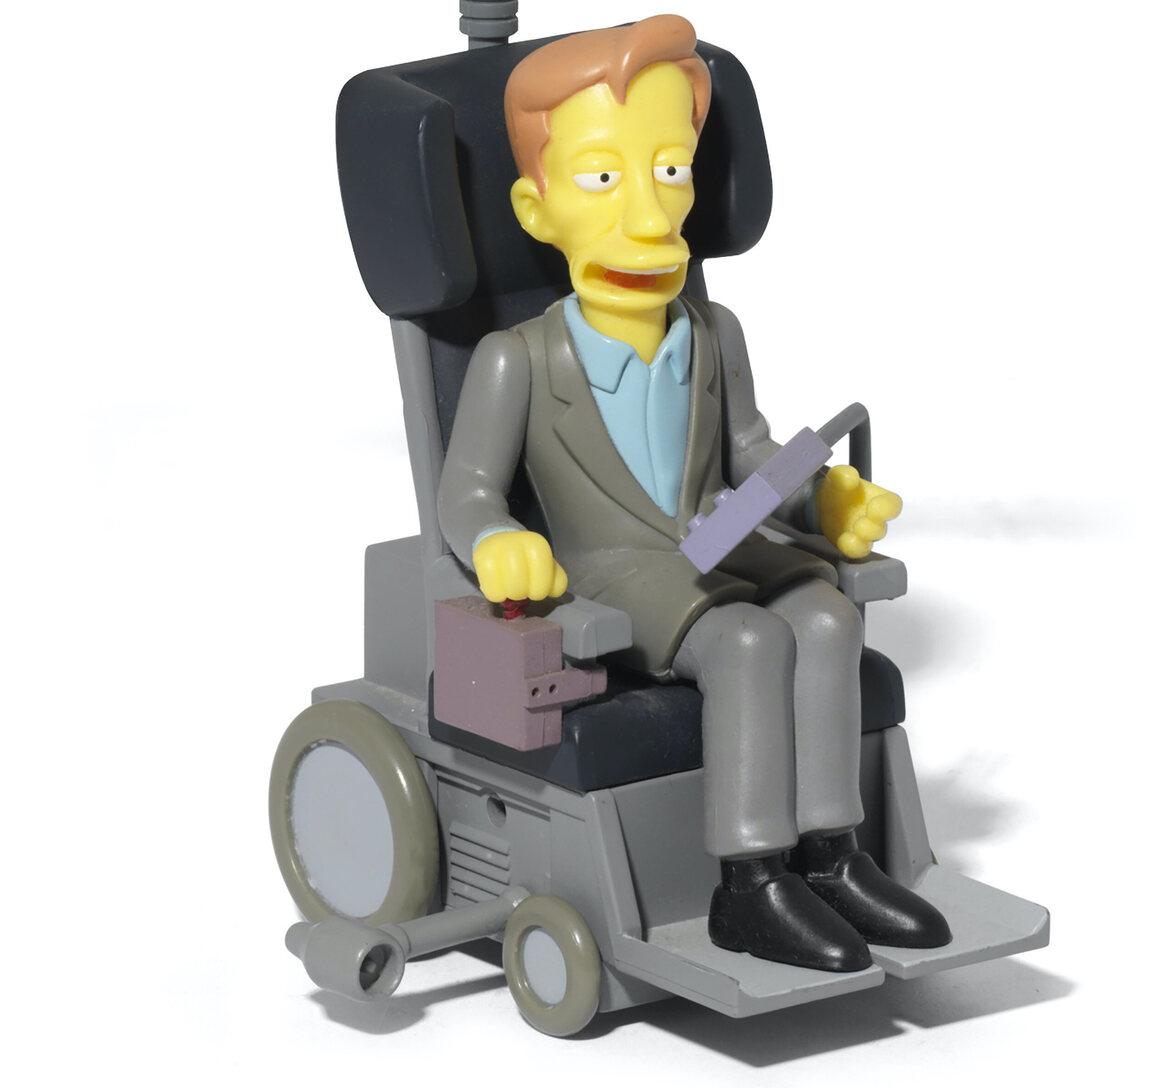 Stephen Hawking's personal <I>The Simpsons</i> figurine.